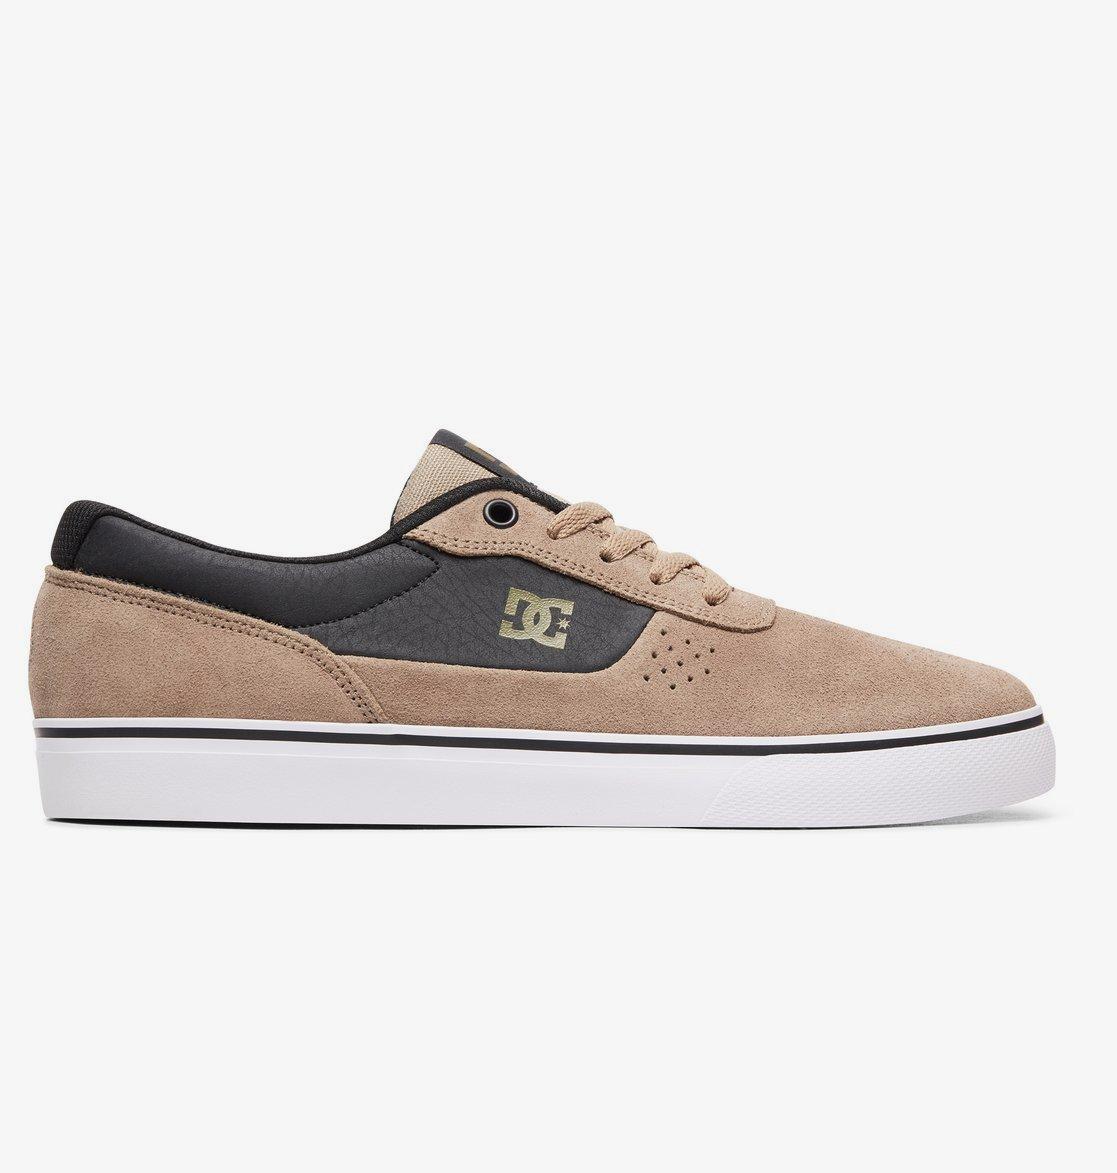 lowest price f55e9 89e65 Switch S - Skate Schuhe für Männer